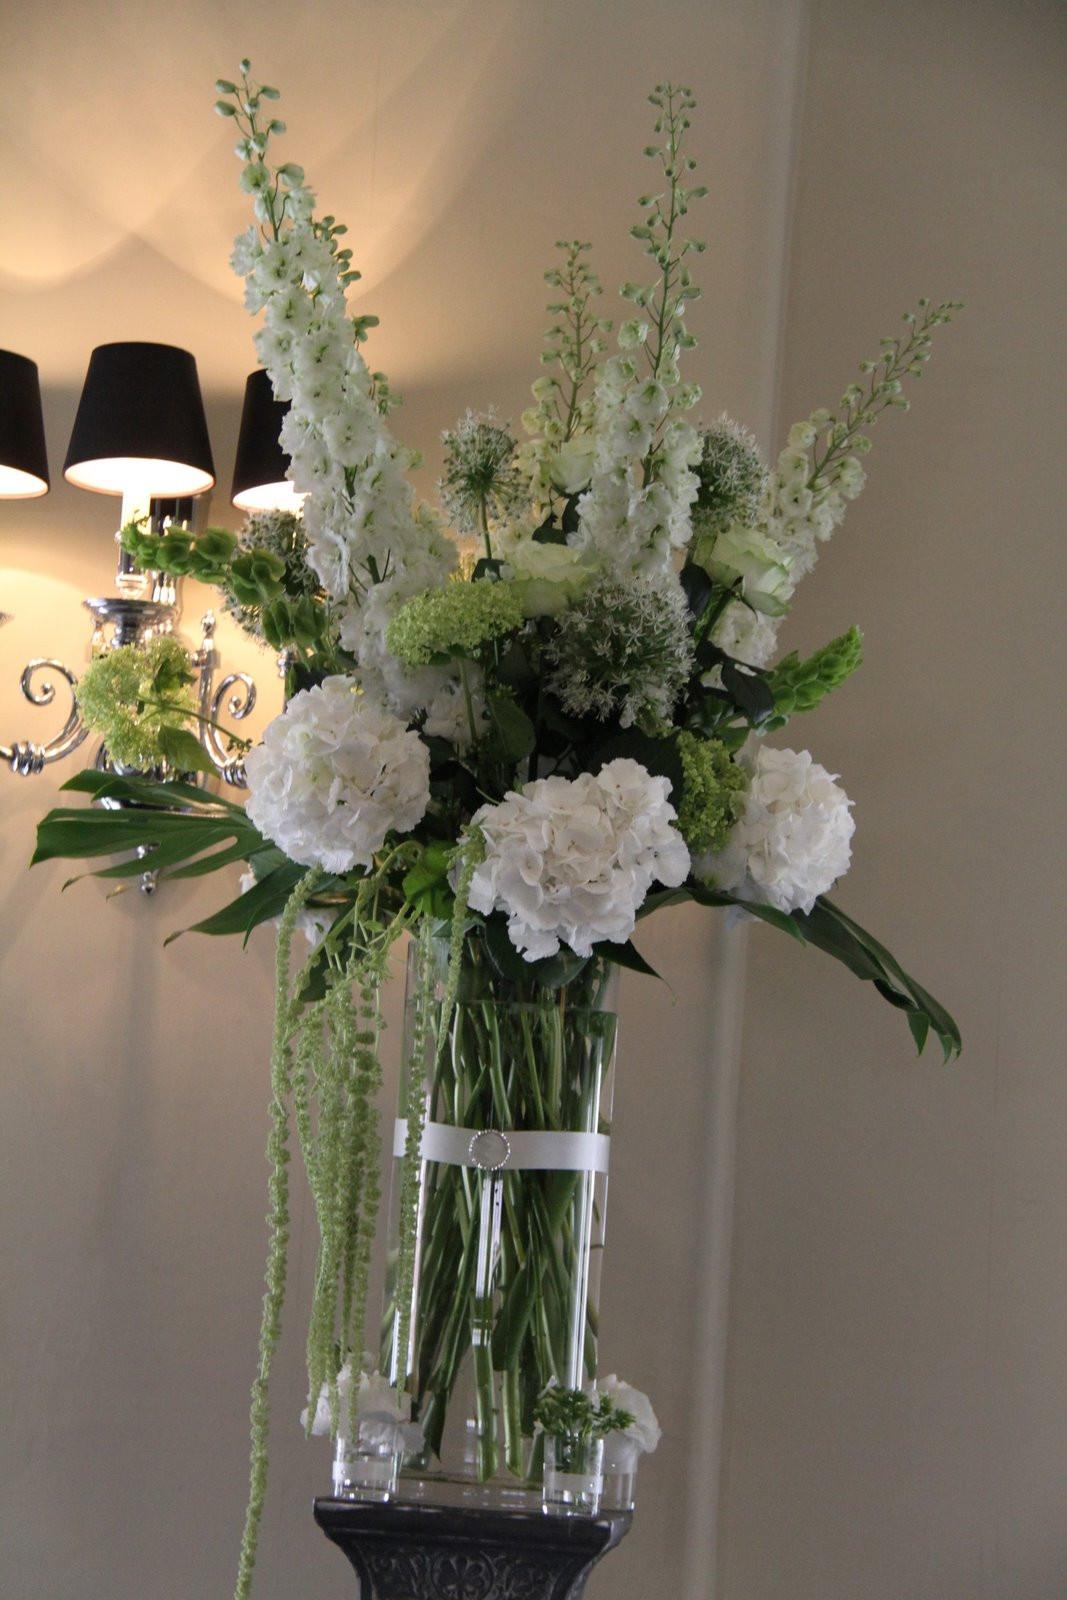 capodimonte flower vase of the grand lodge st annes lorraine jones throughout hotel grand palladium vallarta resort and spa